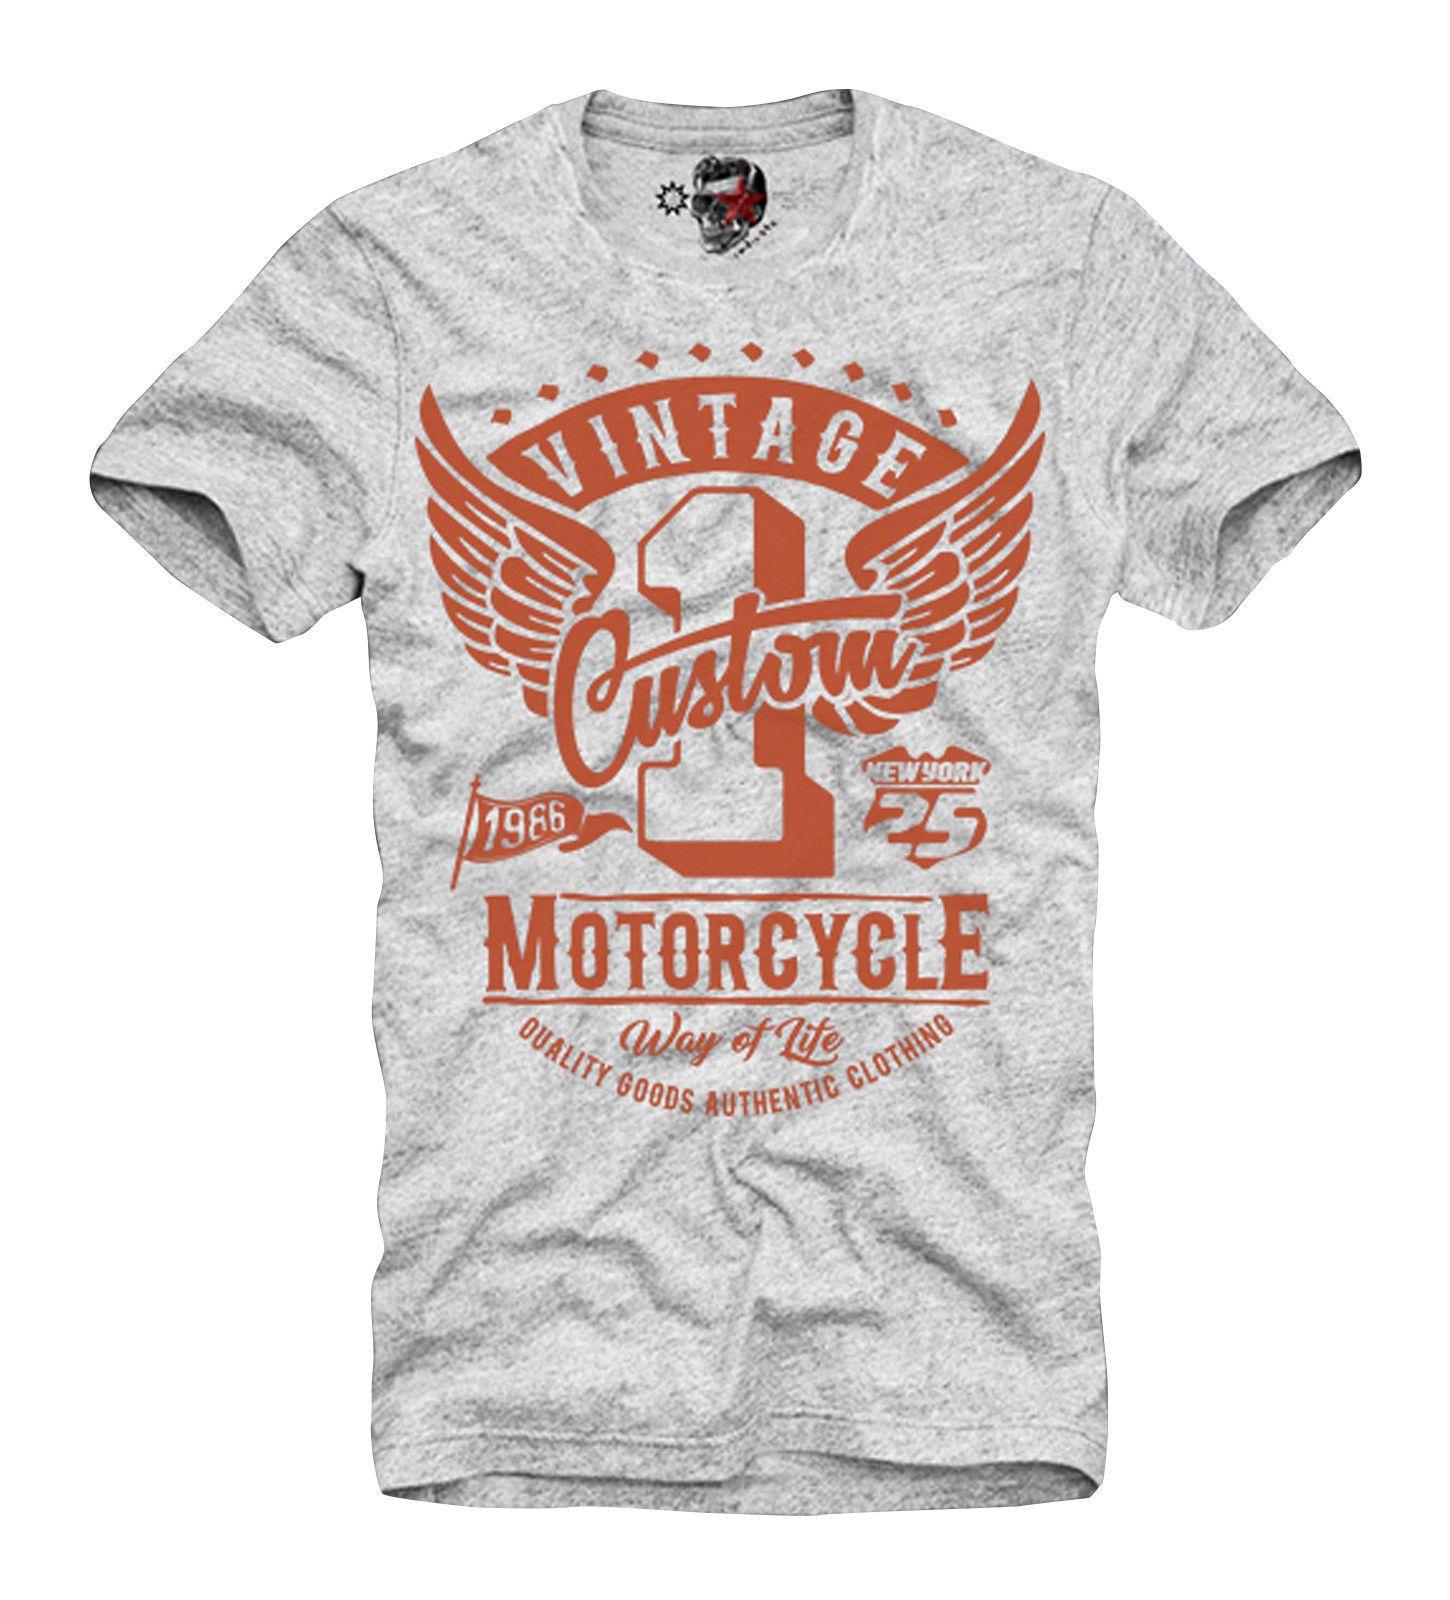 0495972ec54549 E1SYNDICATE T SHIRT MOTOCROSS Top Tee MOTORRAD BIKE DUCATI CAFE RACER 3414G  Buy Online T Shirts Make Tee Shirts From Dunsechy